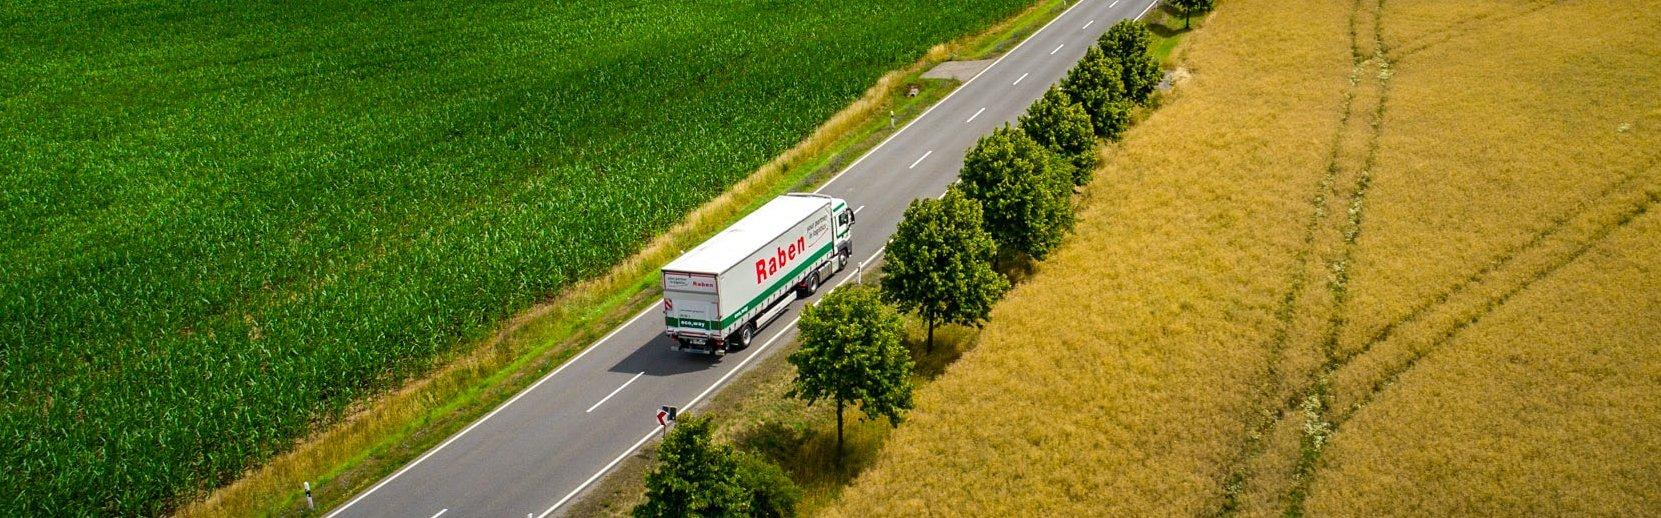 csm_Raben_road_transport_long_truck_old_branding_2-min_fa2b378d49.jpg